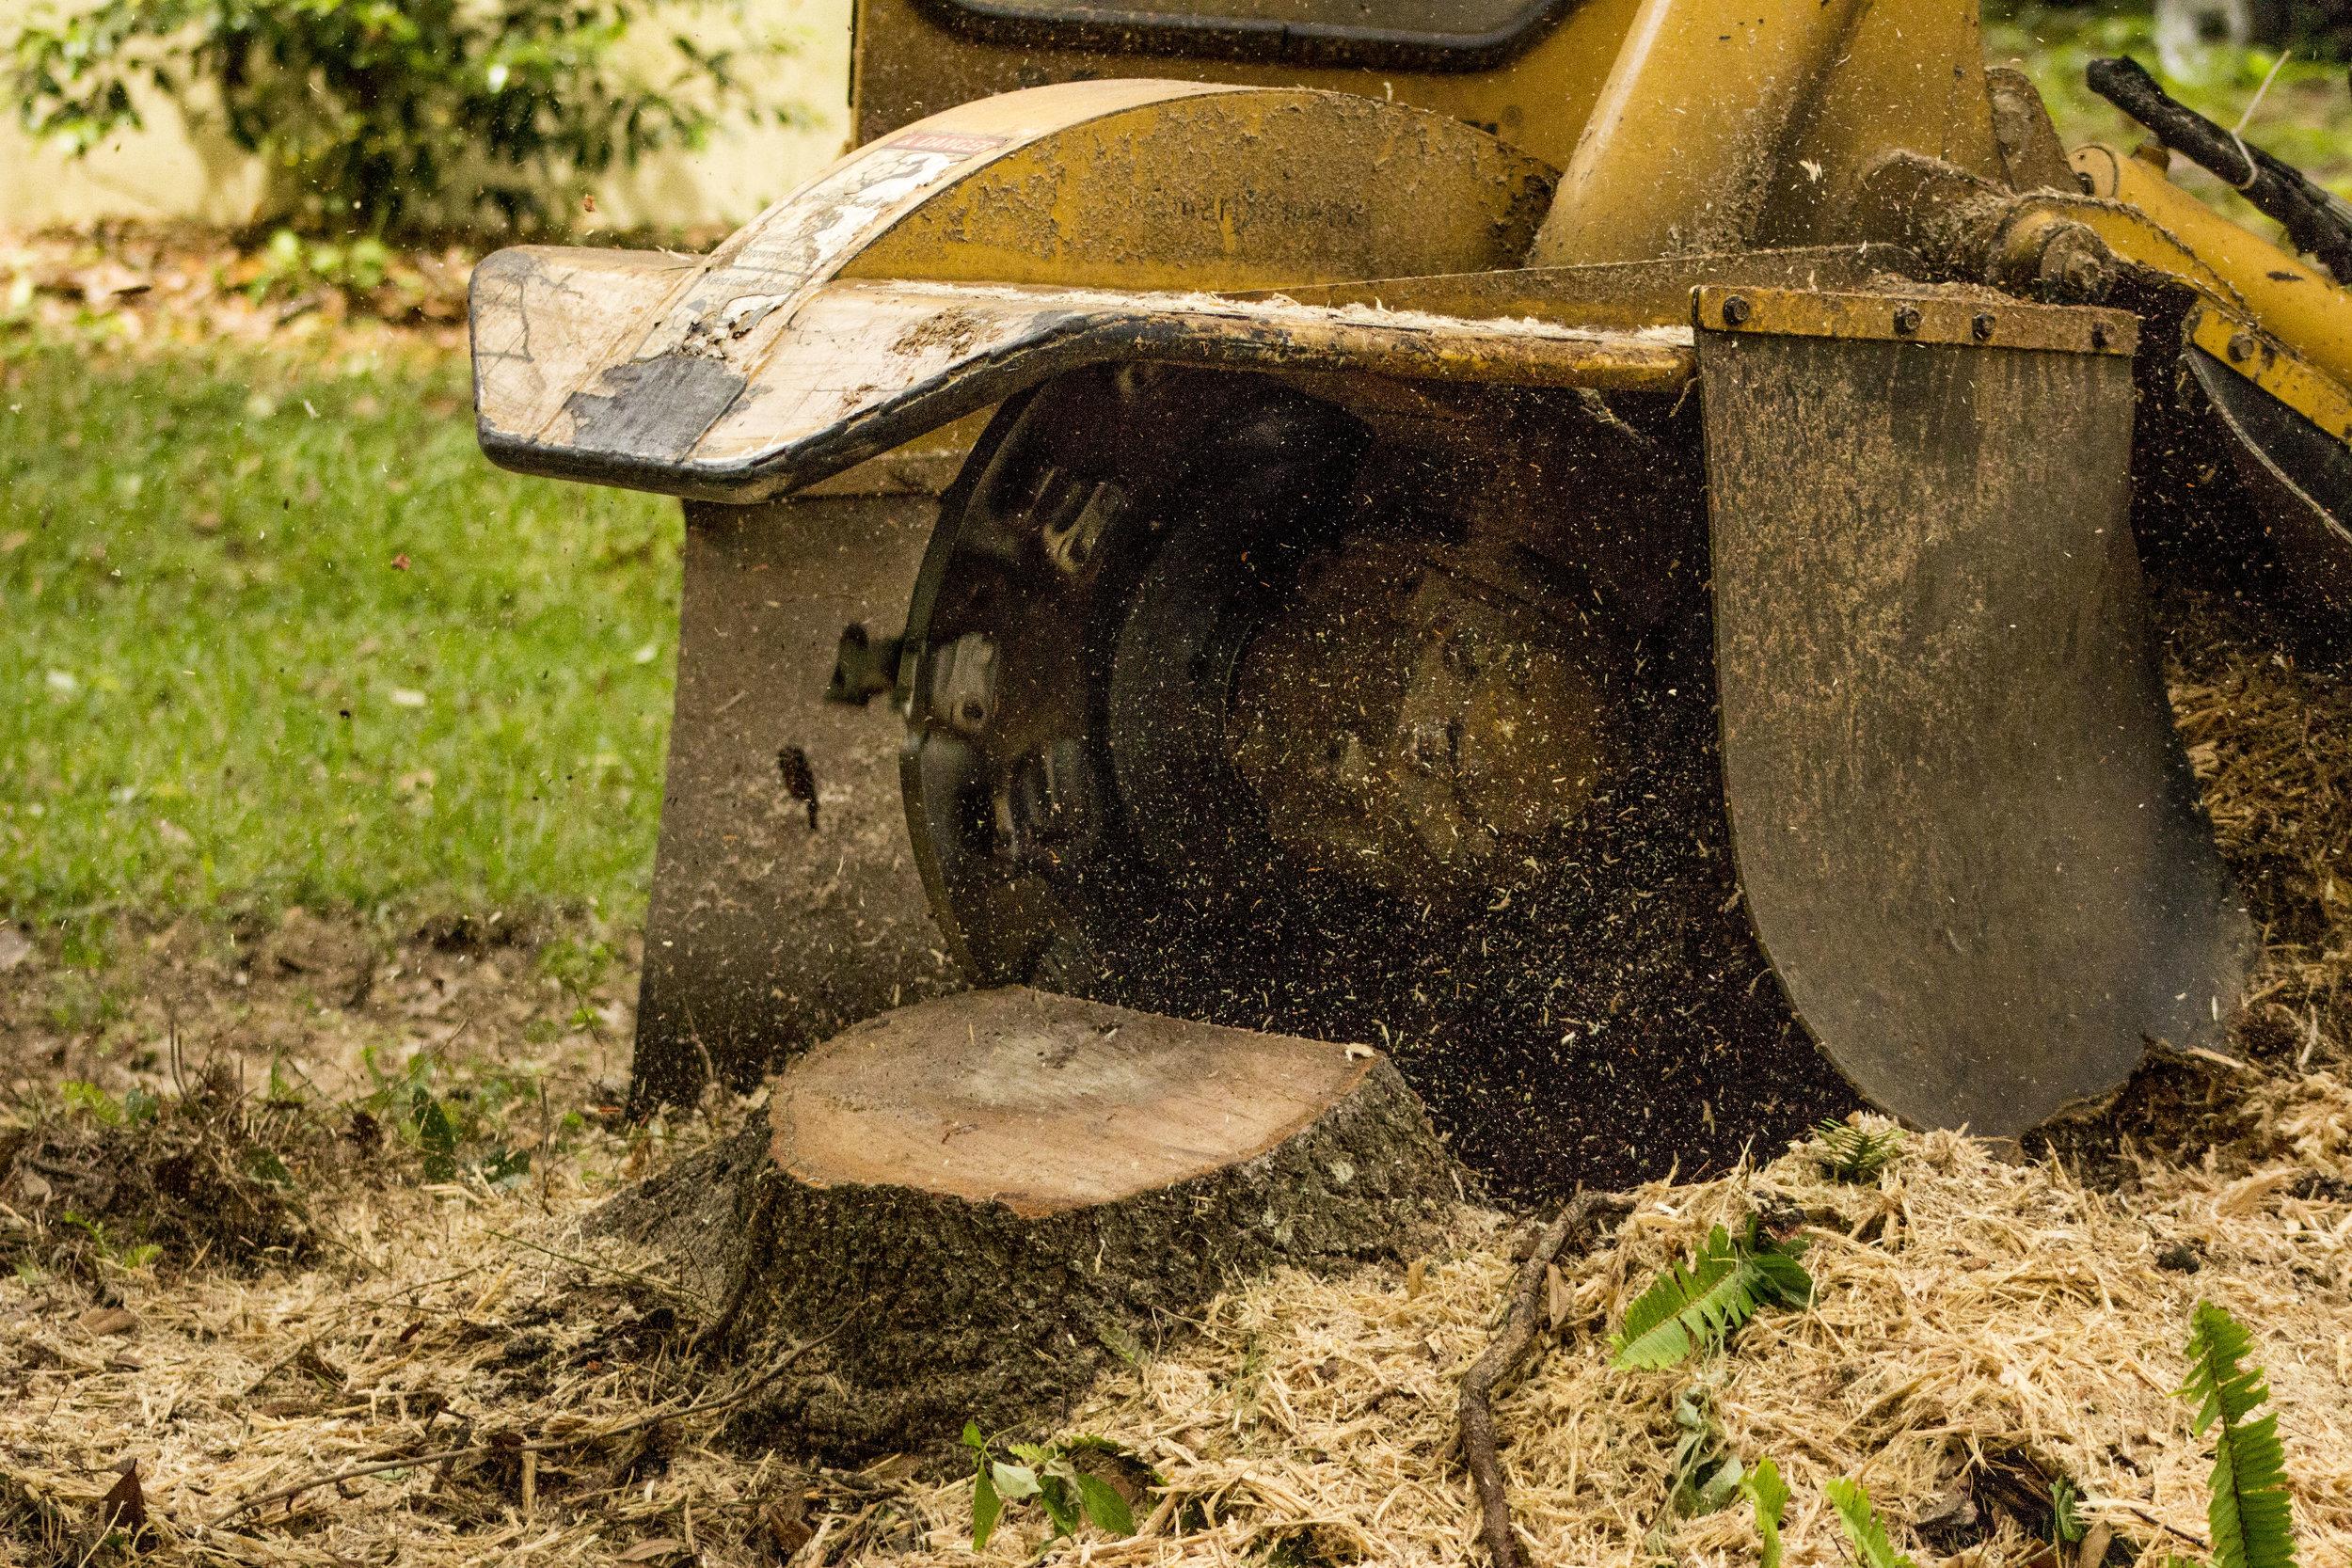 Stump Grinder removing a tree stump